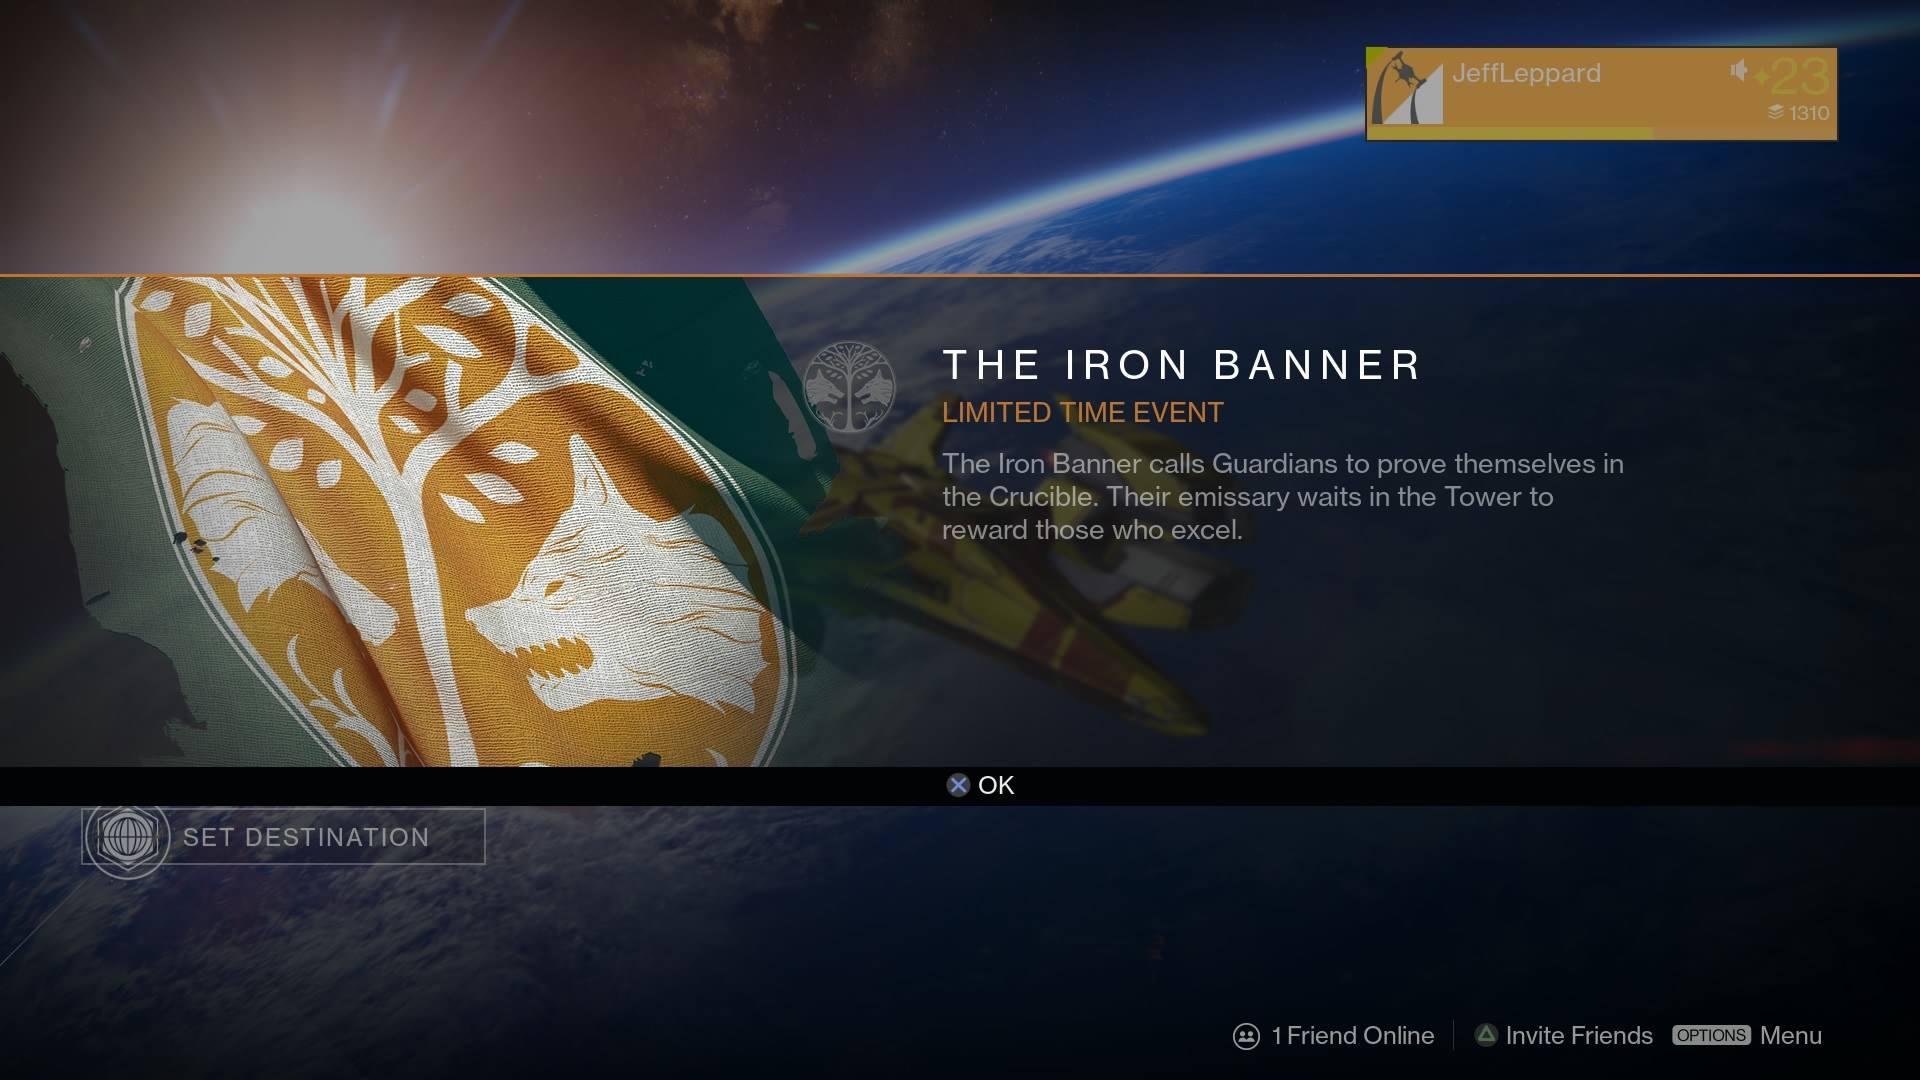 Destinys Iron Banner Is No Longer Live Bungie Explains Why UPDATE VG247